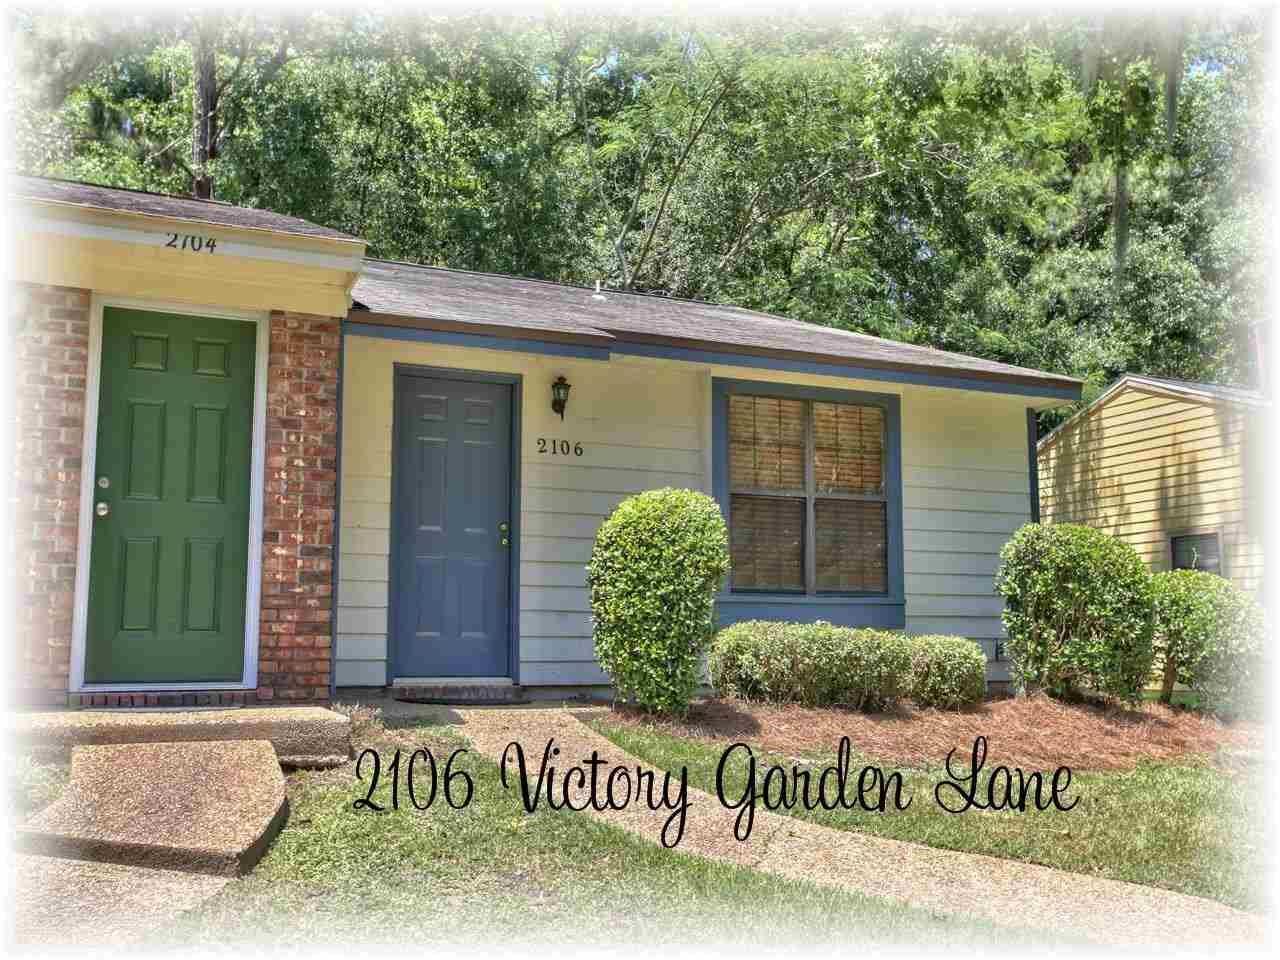 2106 VICTORY GARDEN Lane #-, Tallahassee, FL 32301 - MLS#: 332347